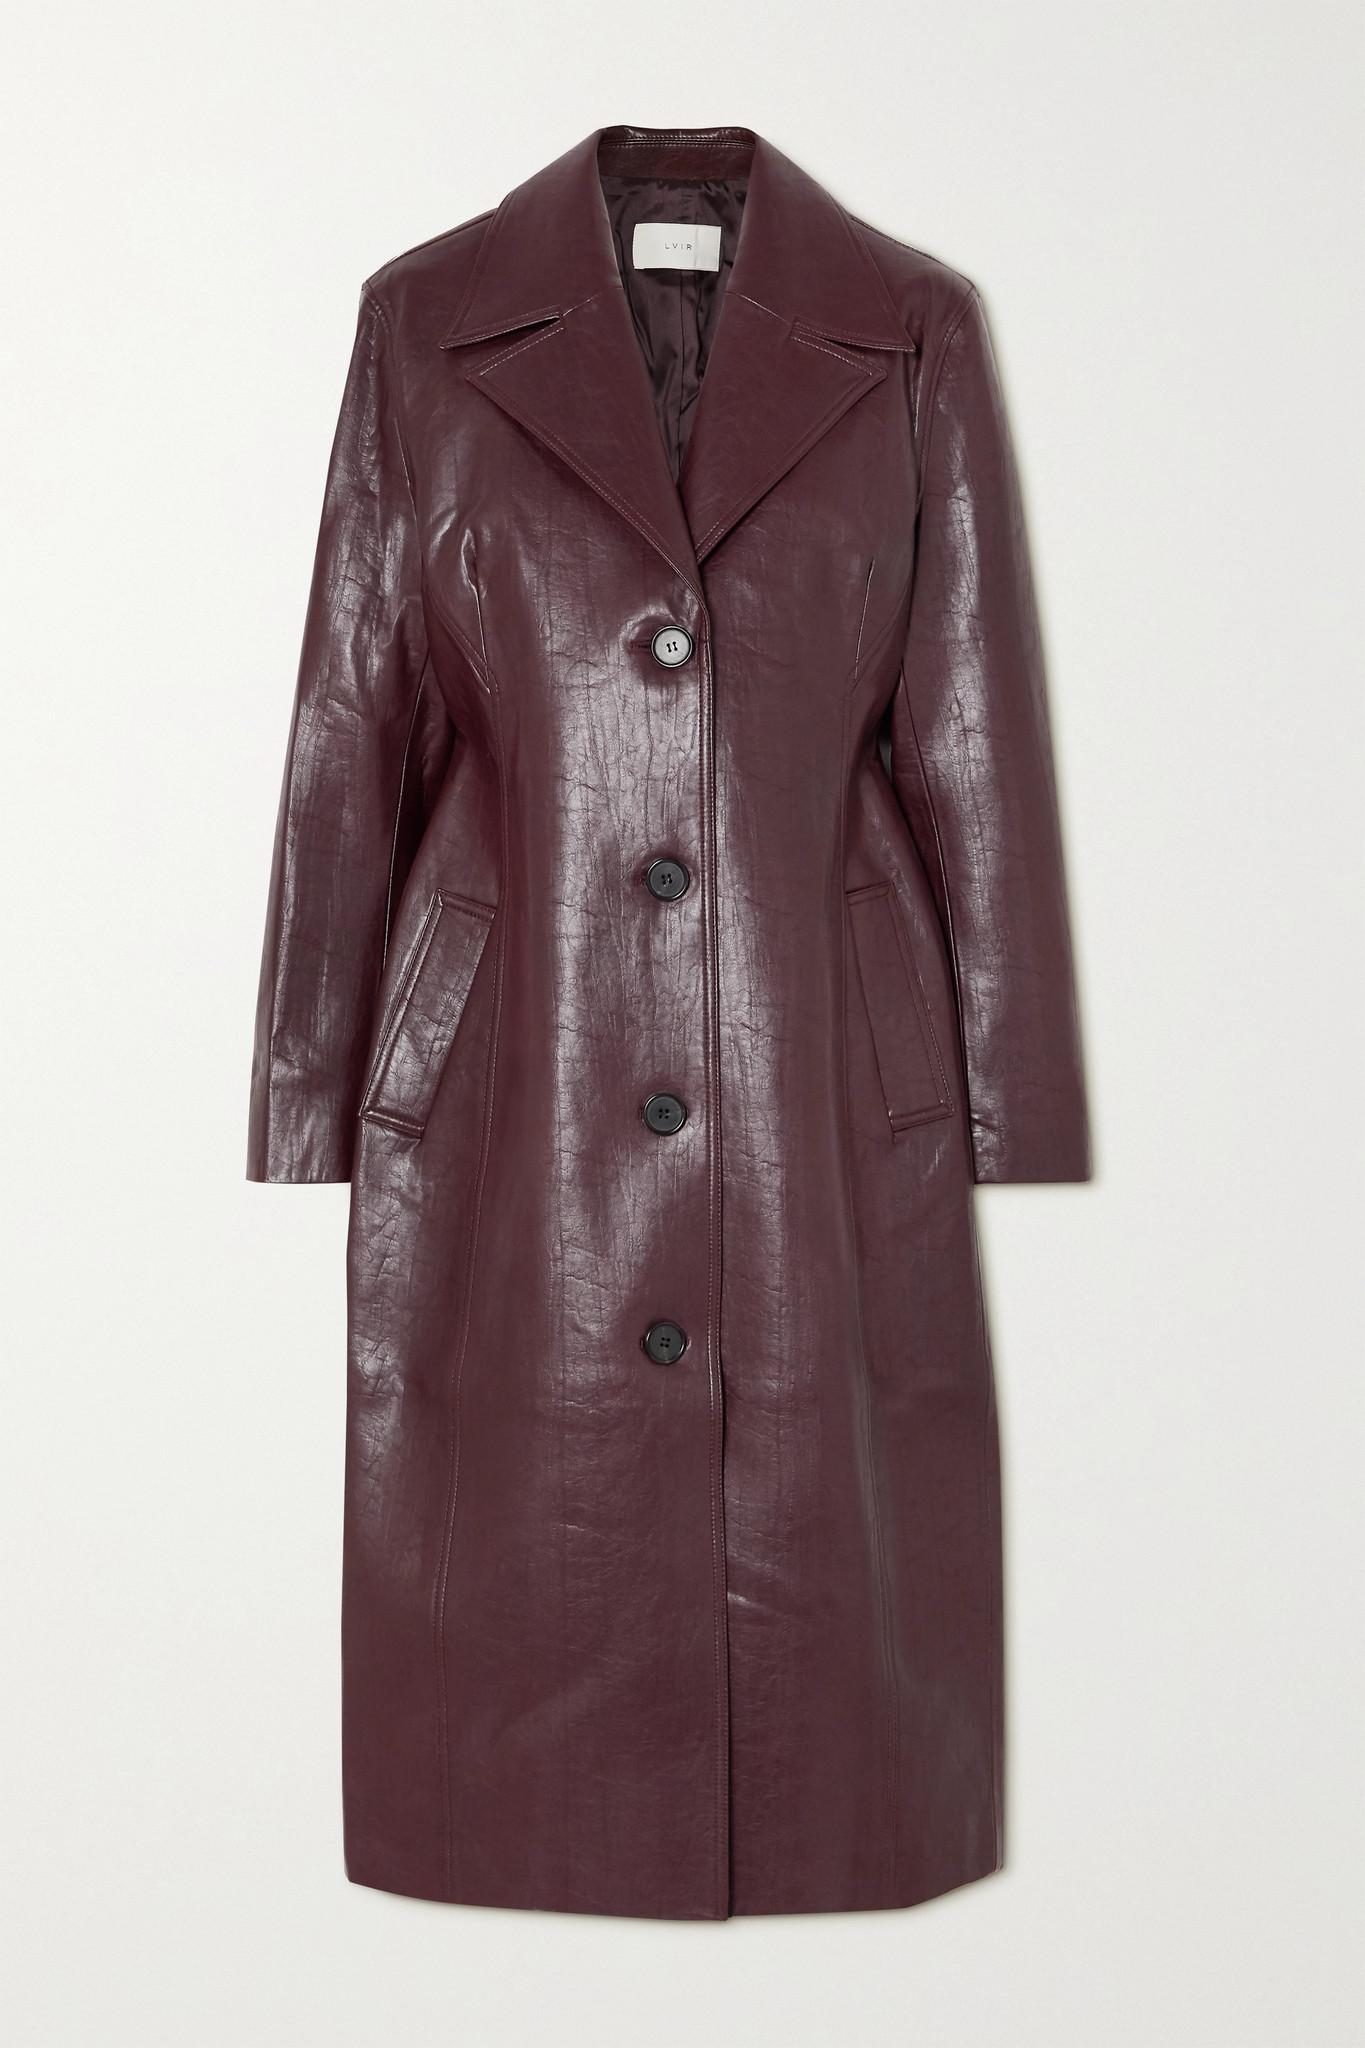 LVIR - Faux Leather Coat - Burgundy - FR38